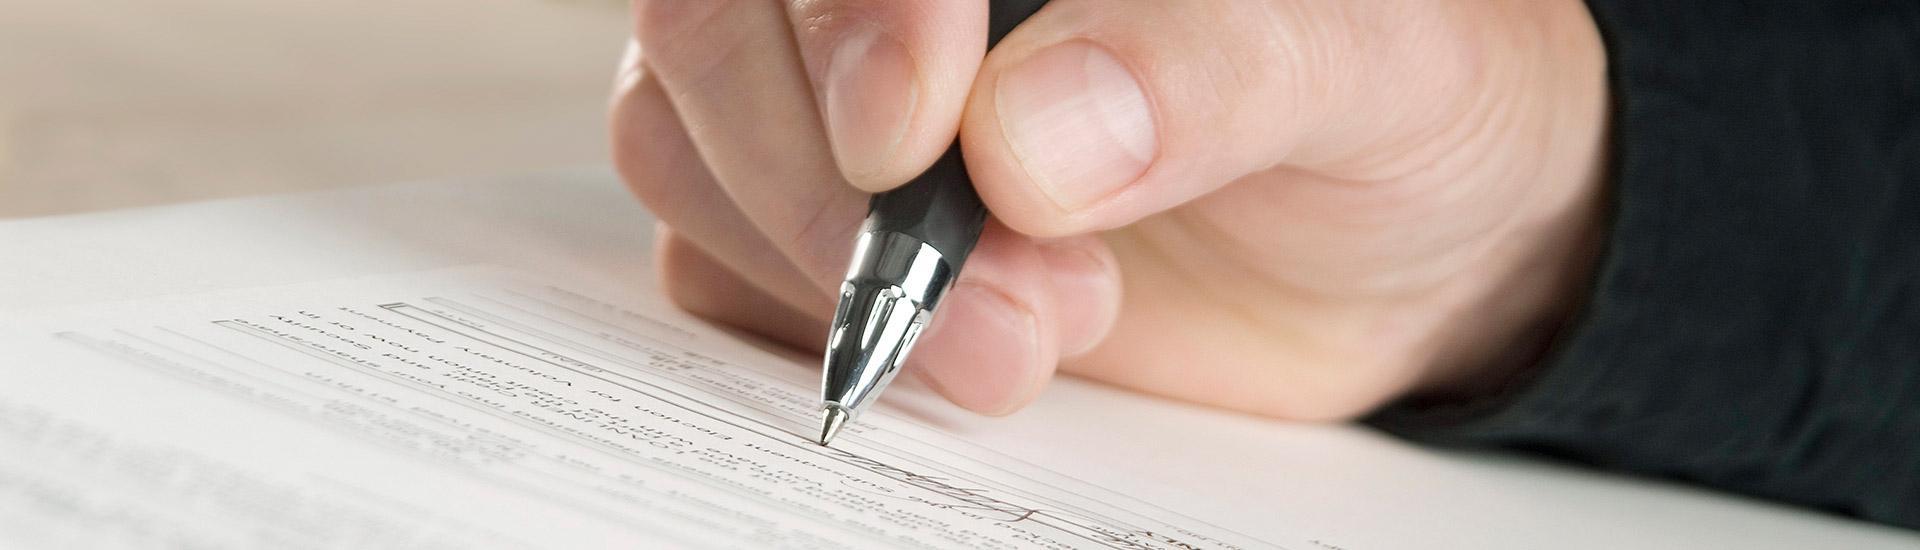 Title Insurance in Midland, TX, Monahans, TX, Andrews, TX, Crane, TX